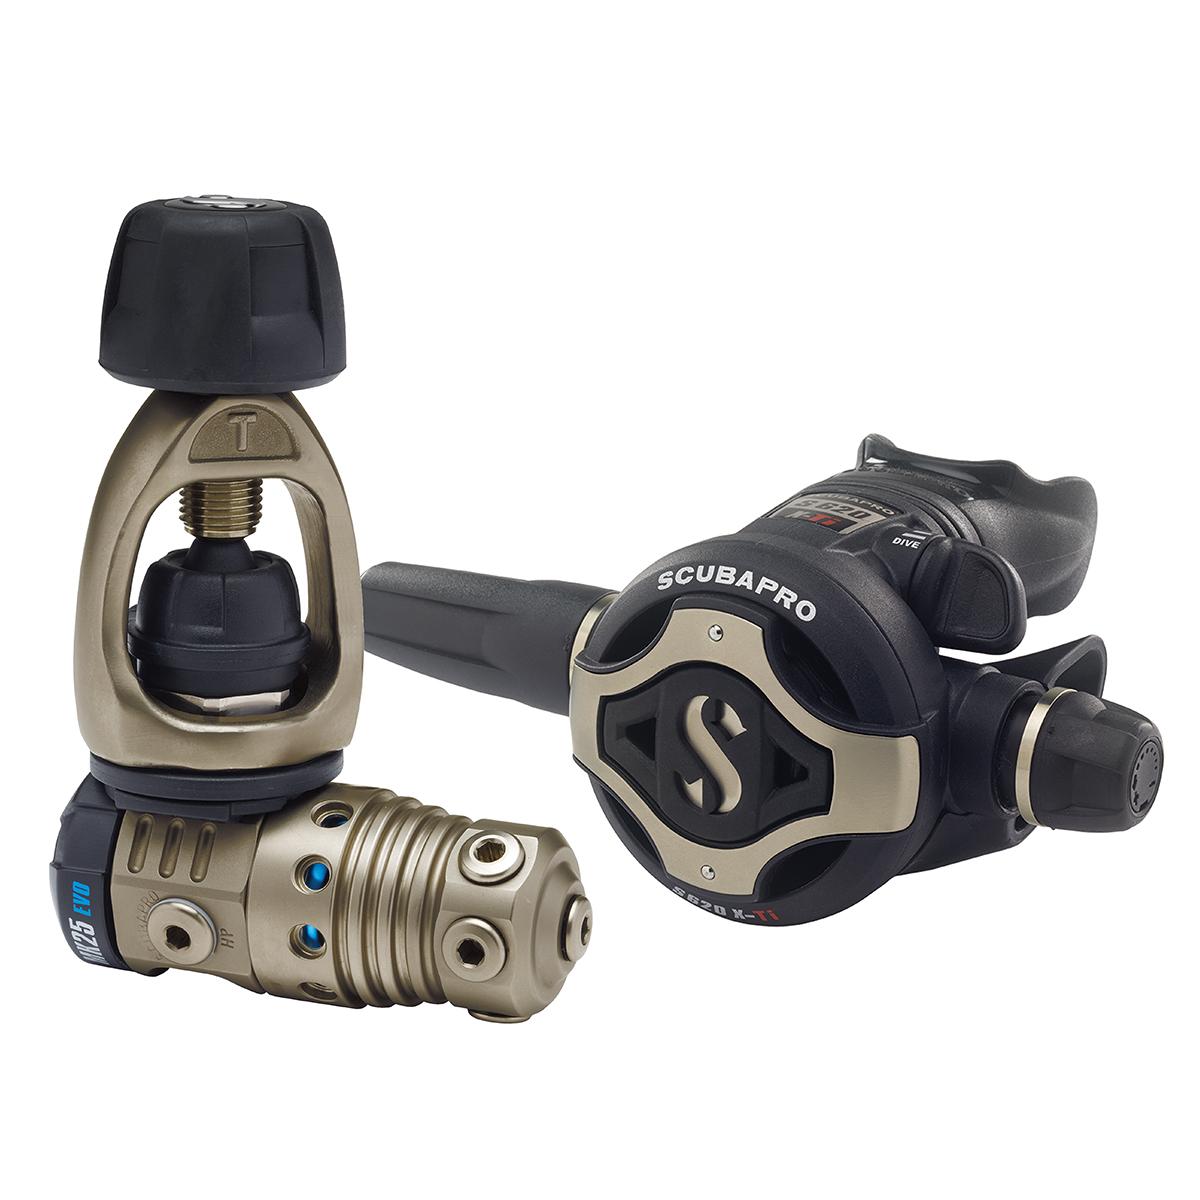 SCUBAPRO MK25T EVO / S620X-Ti Balanced Dive Regulator System, INT/Yoke Connector